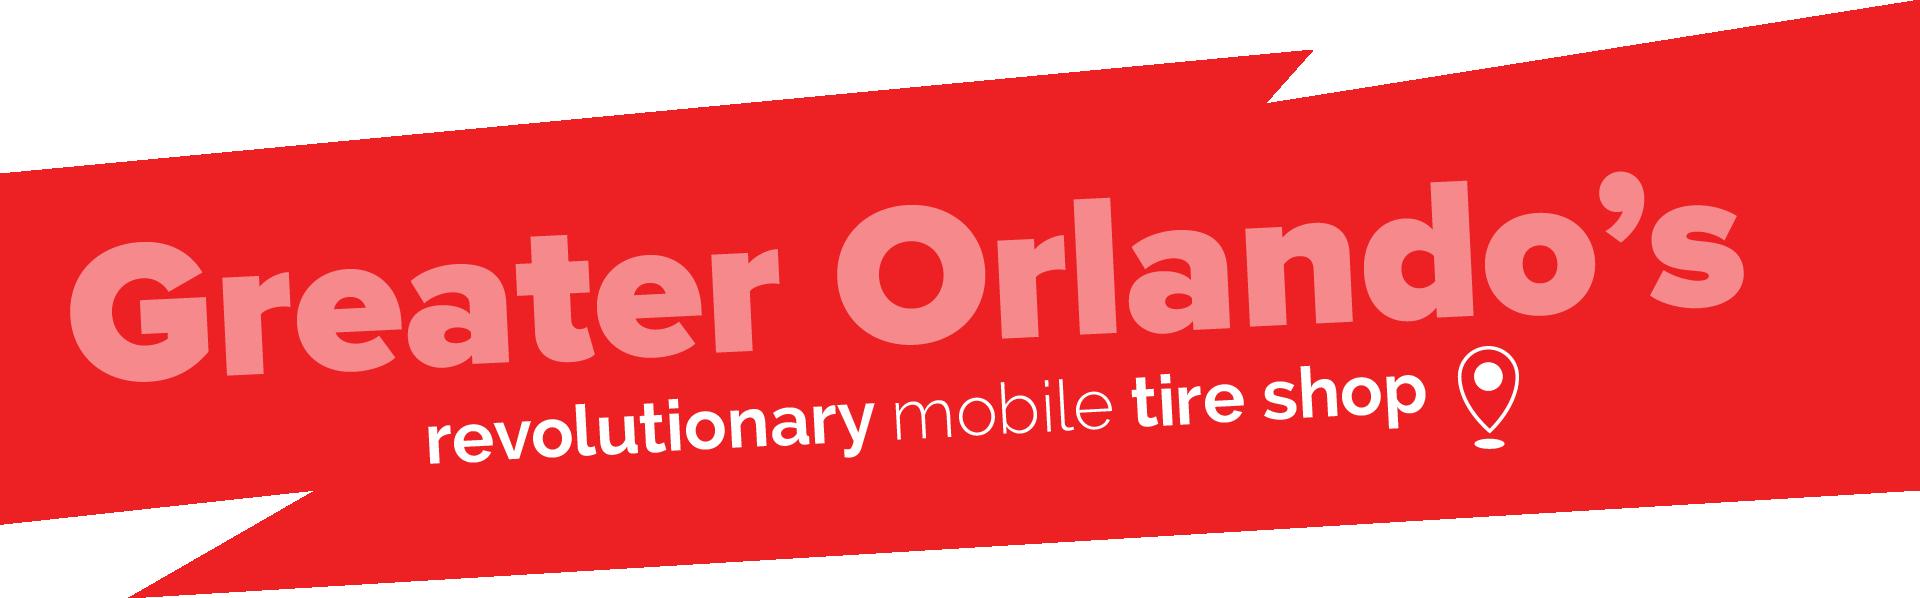 Orlando's premier Mobile Tire Shop